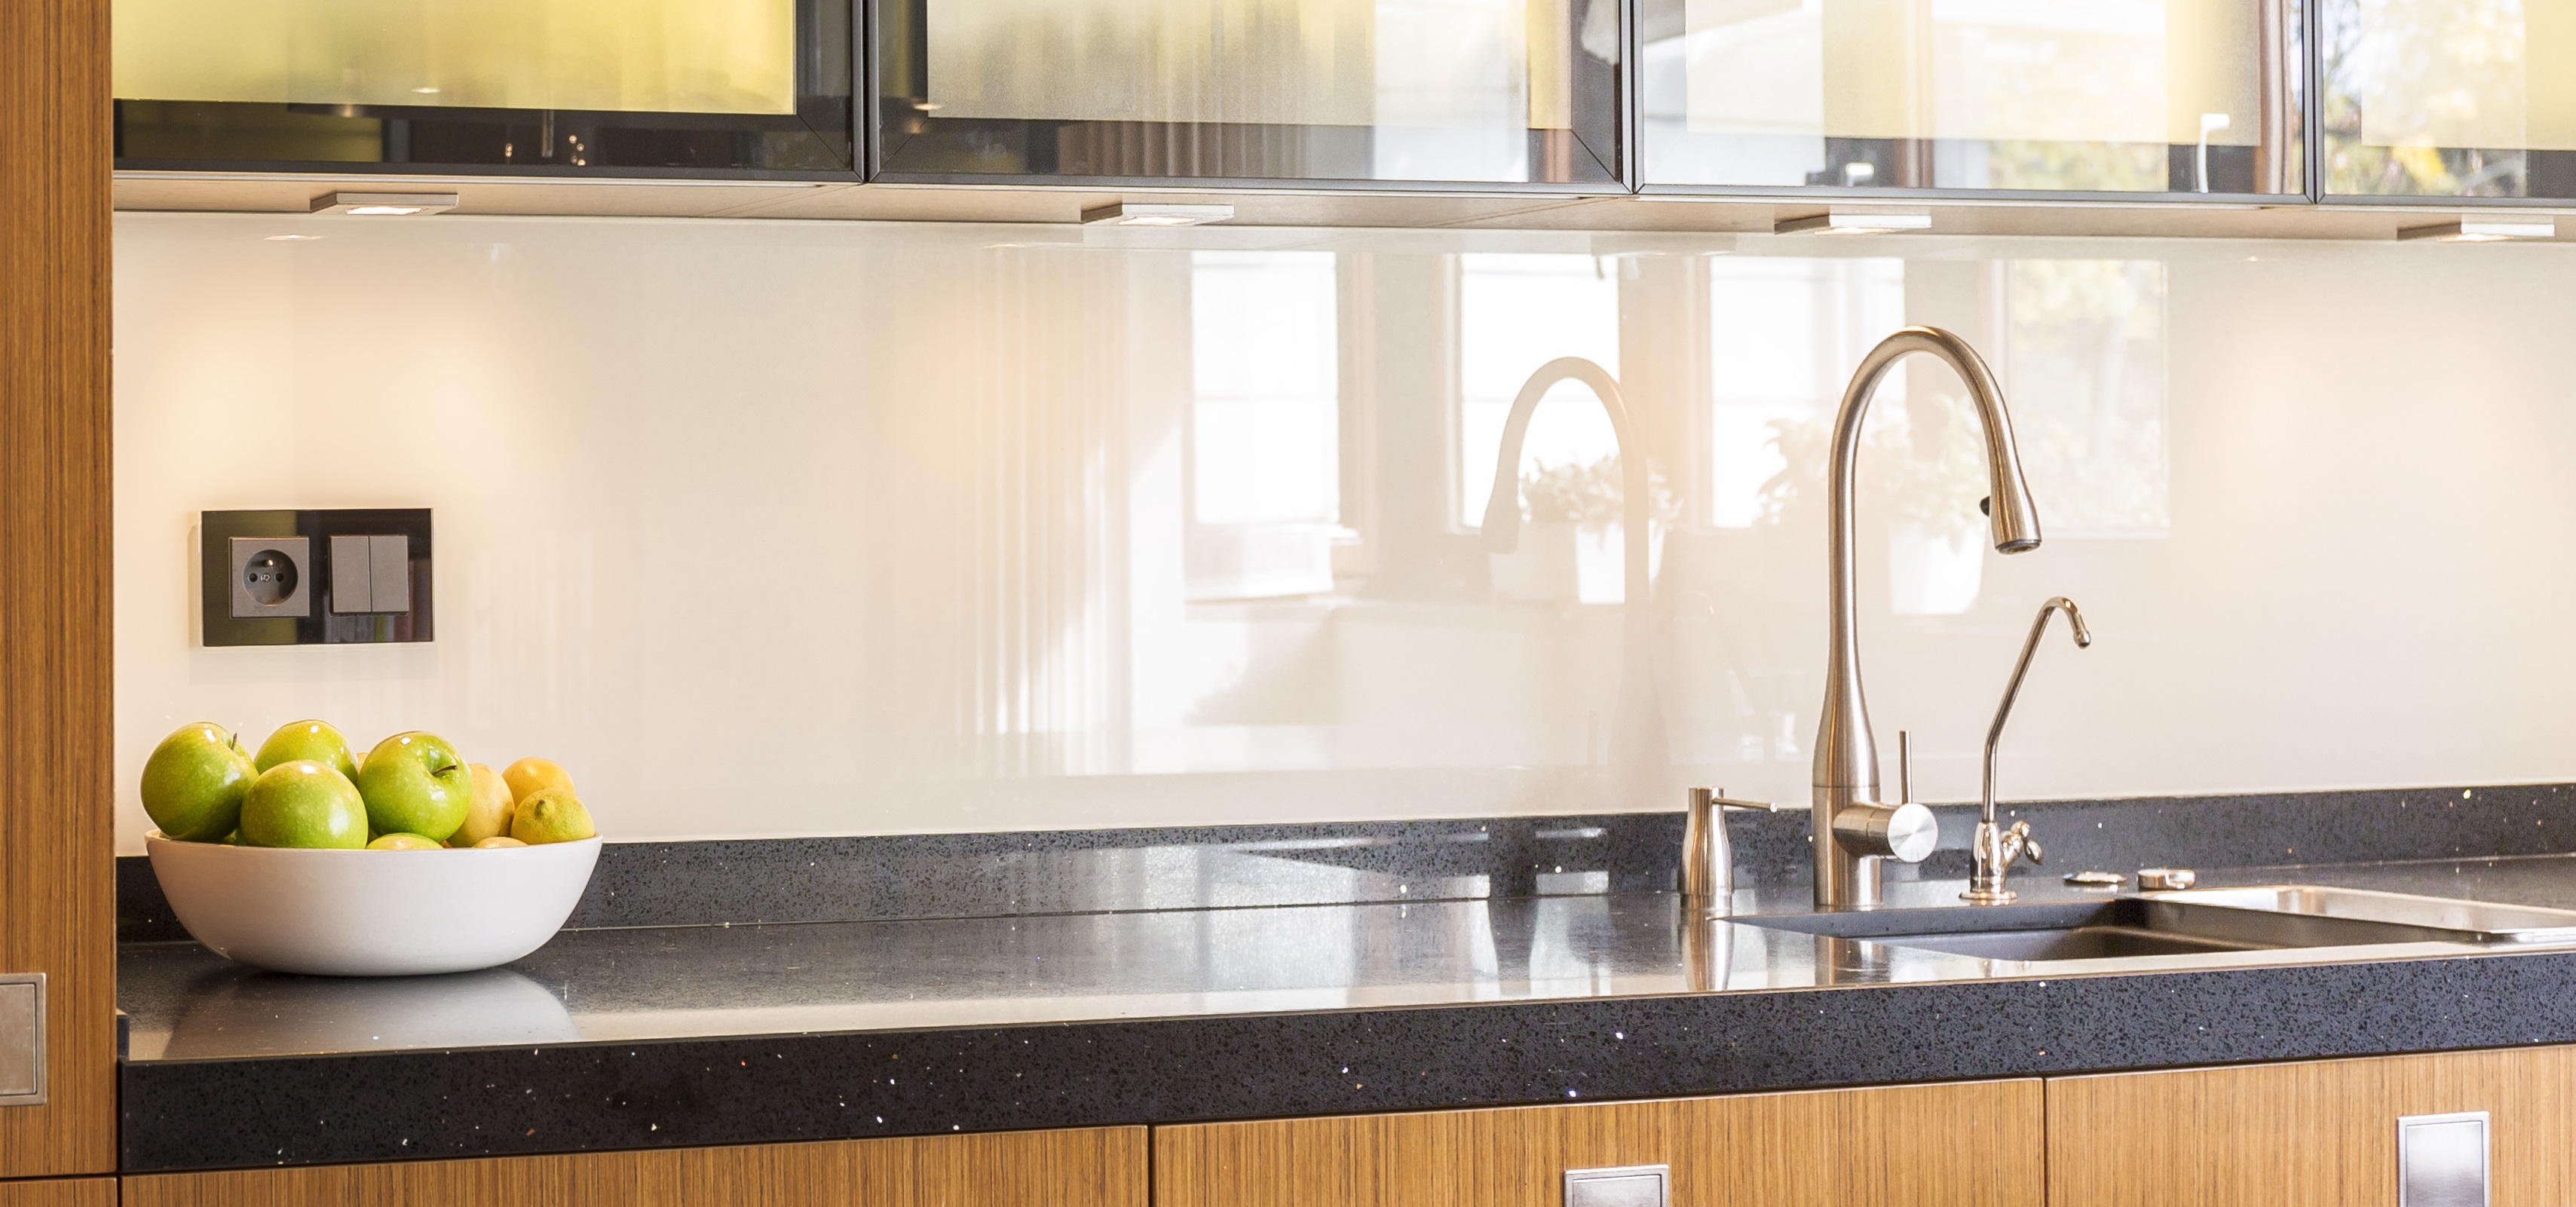 Glass Backsplash Ideas For Your Home Armand Lee Chicago